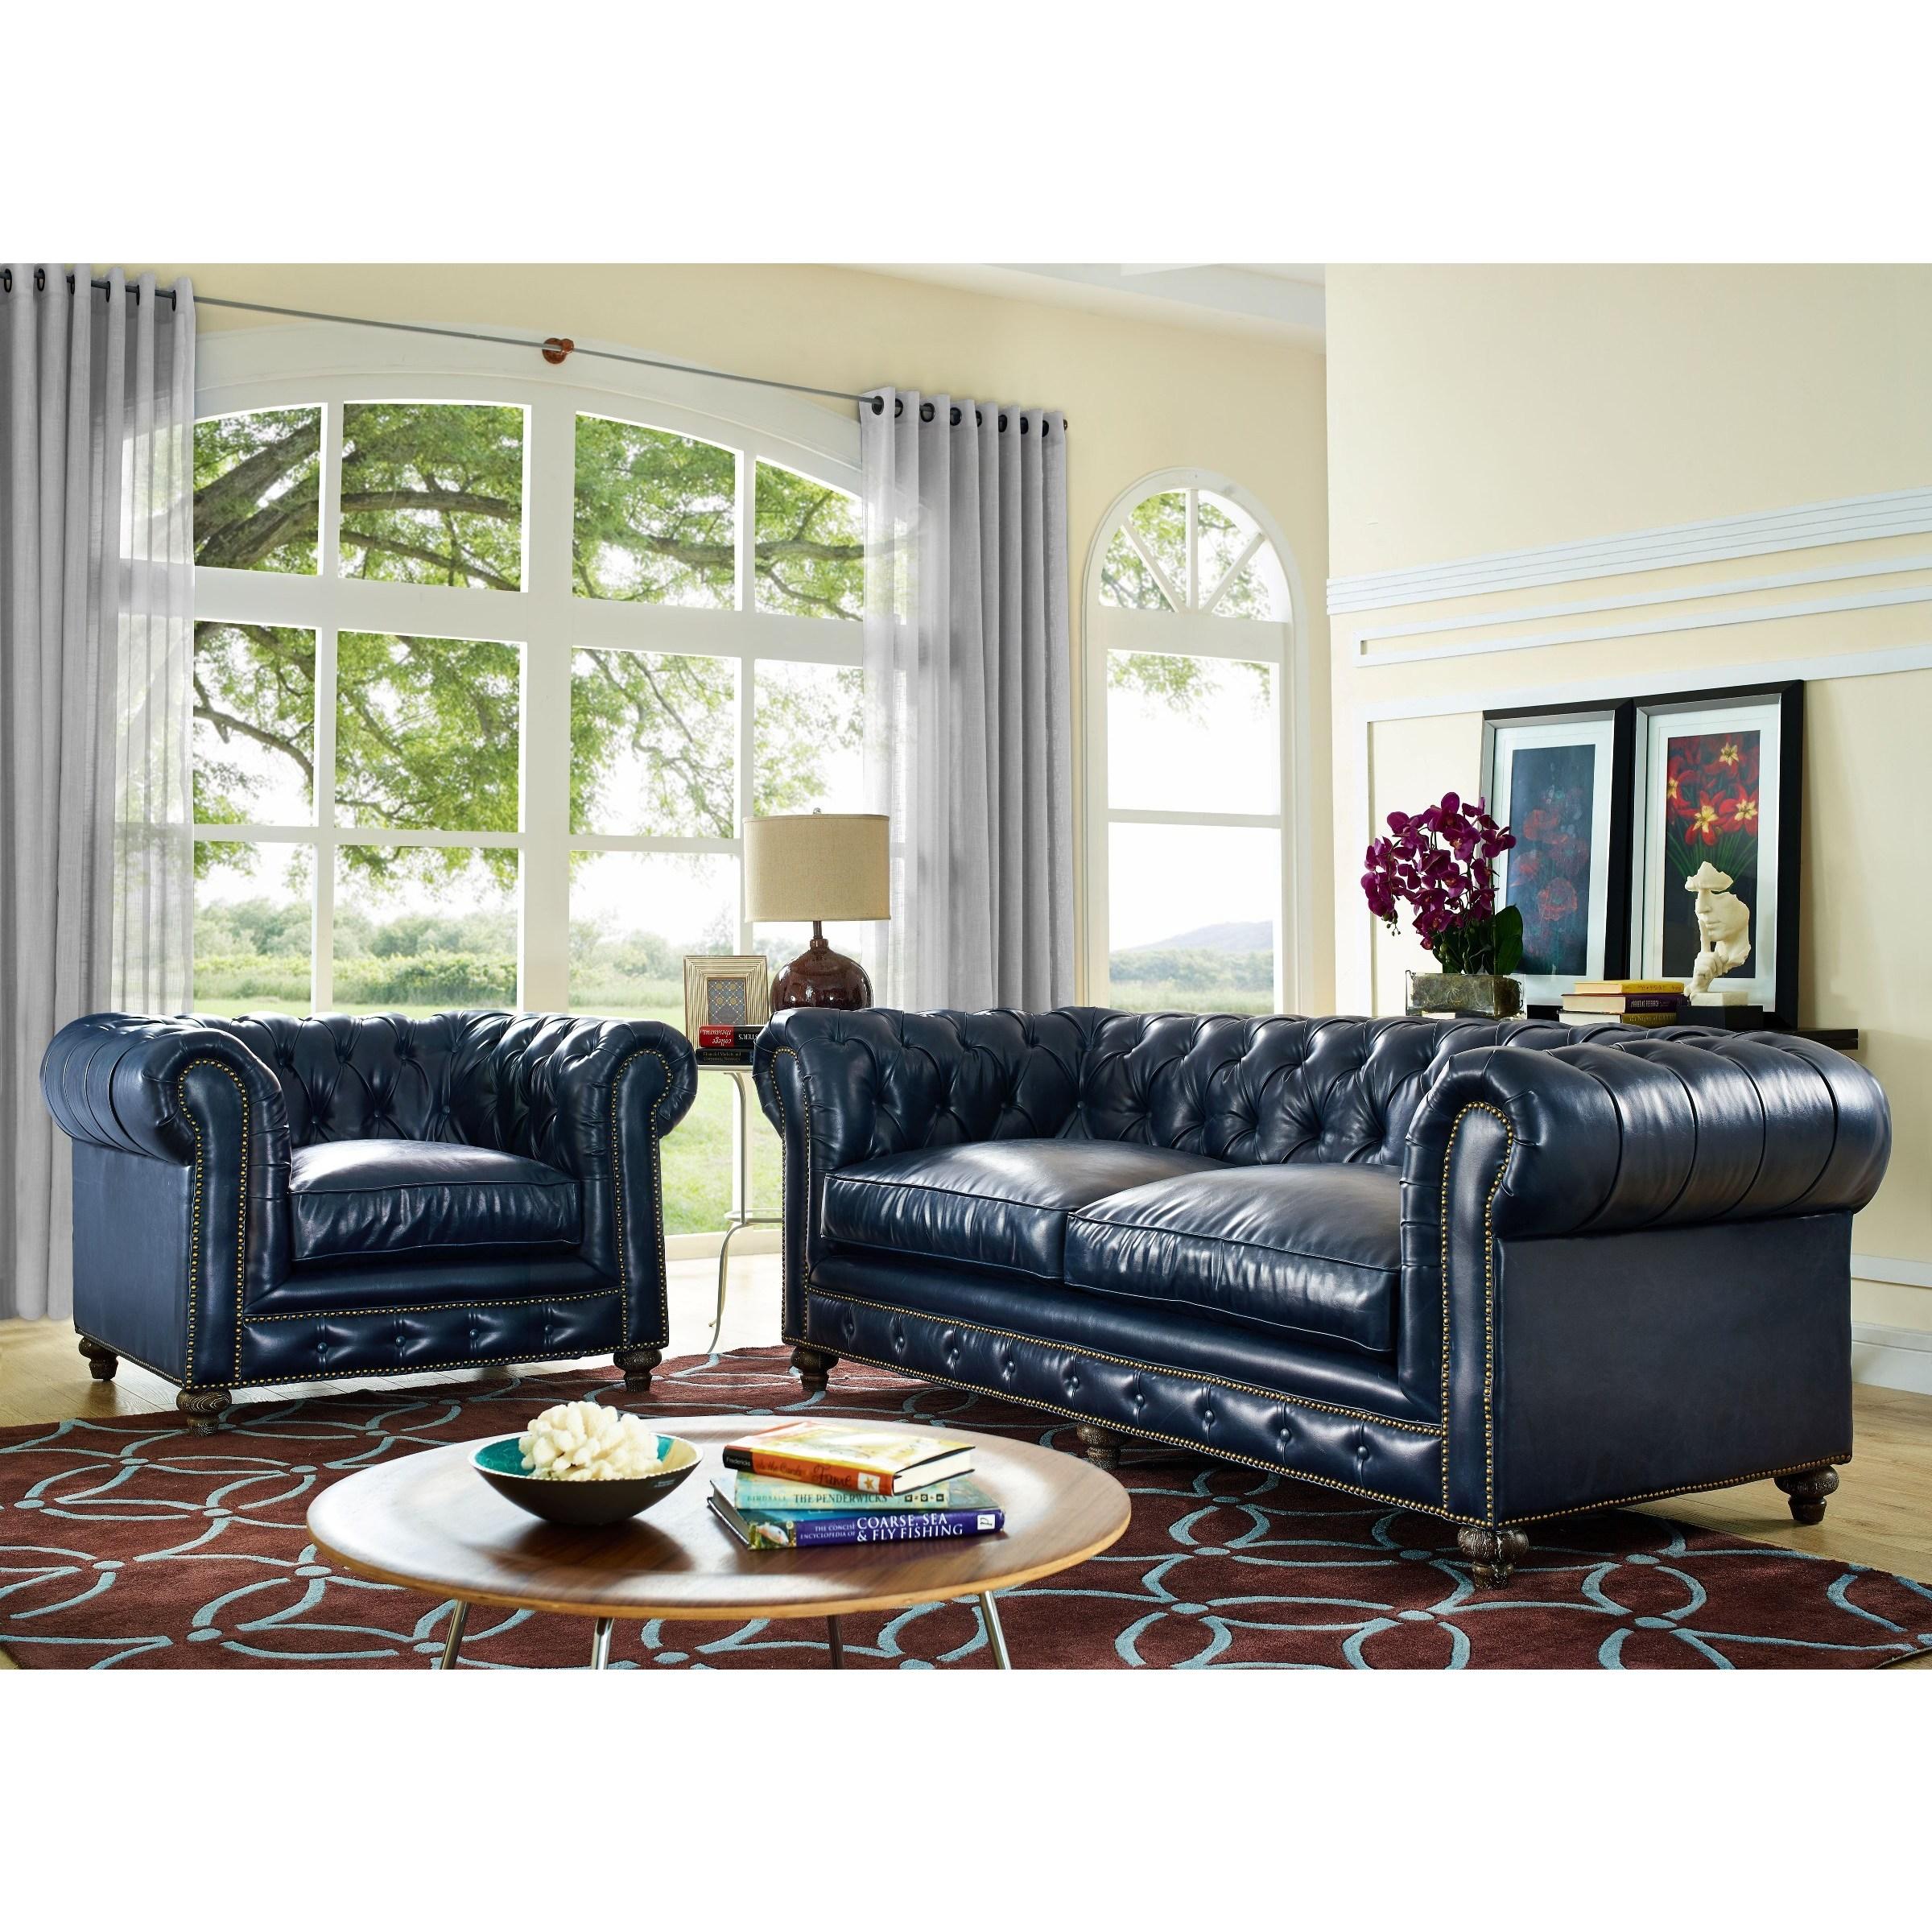 Durango Rustic Blue Leather Living Room Set